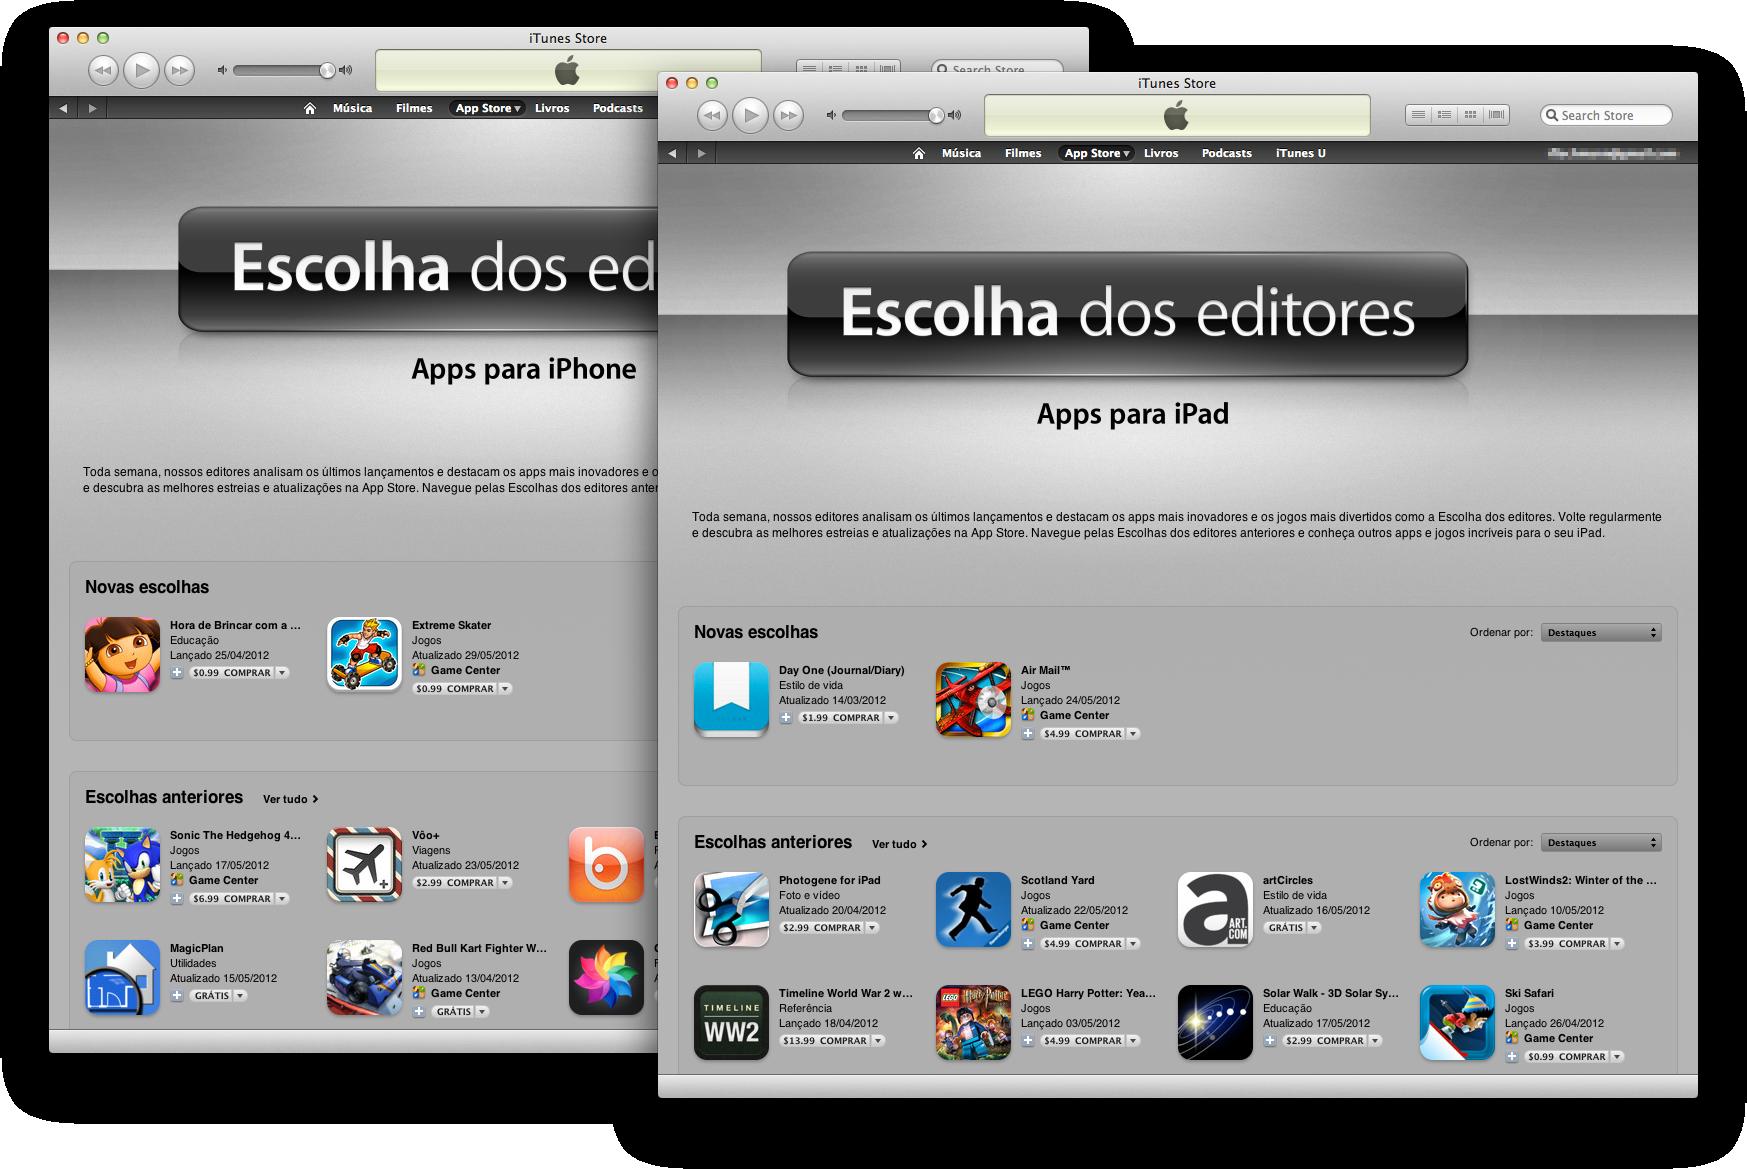 Escolha dos editores na App Store